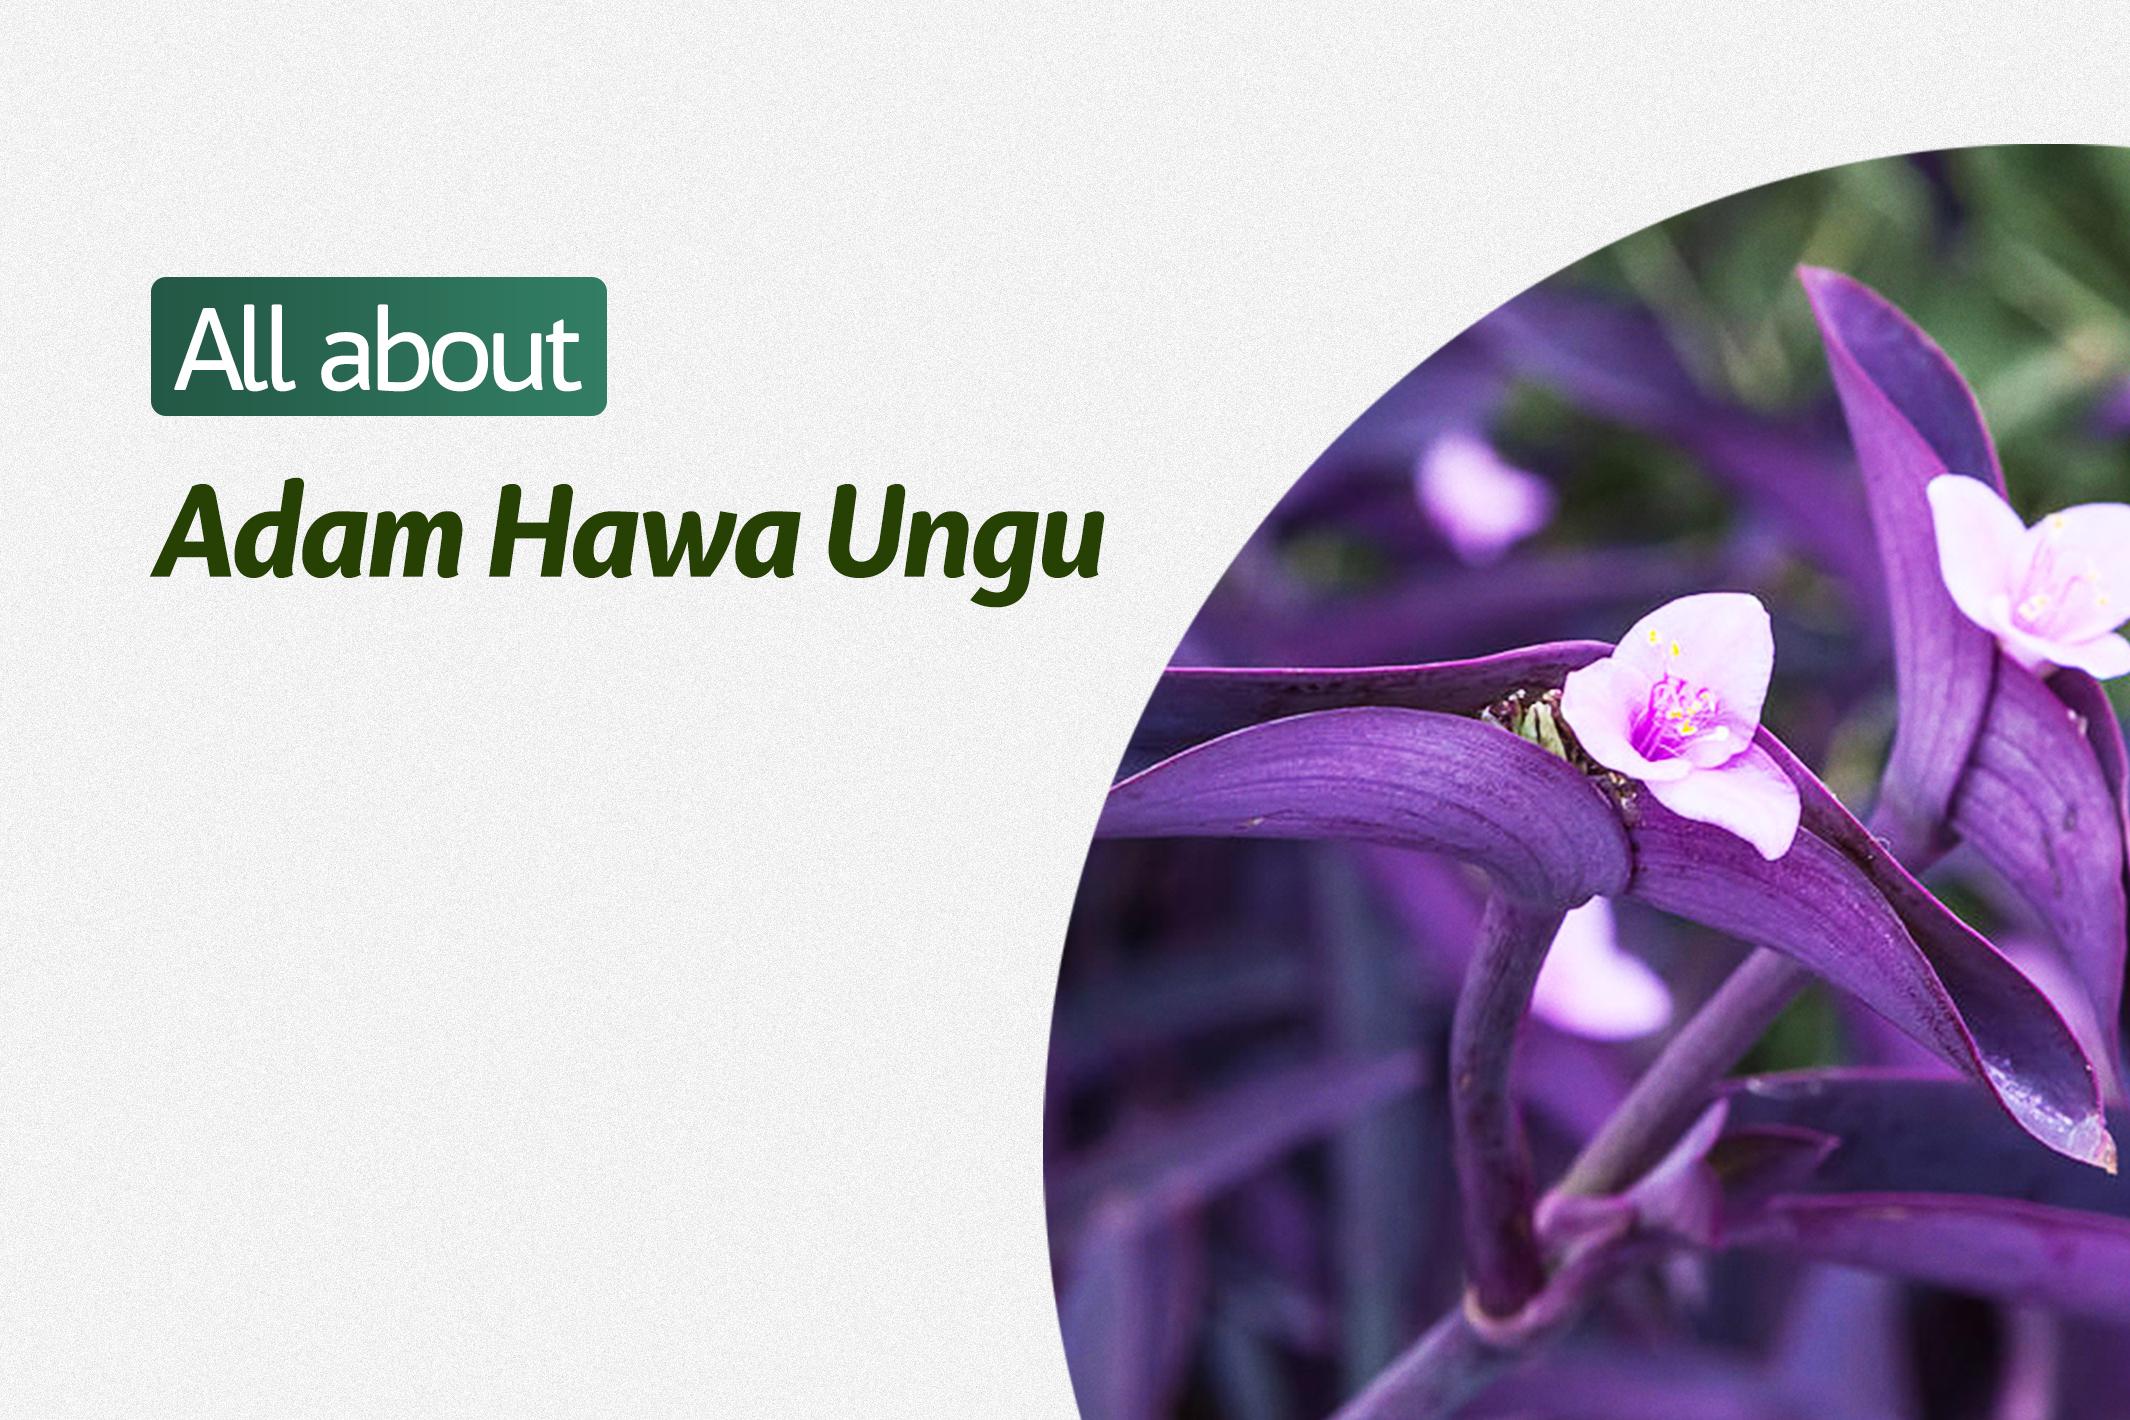 Adam Hawa Ungu (Tradescantia Pallida)